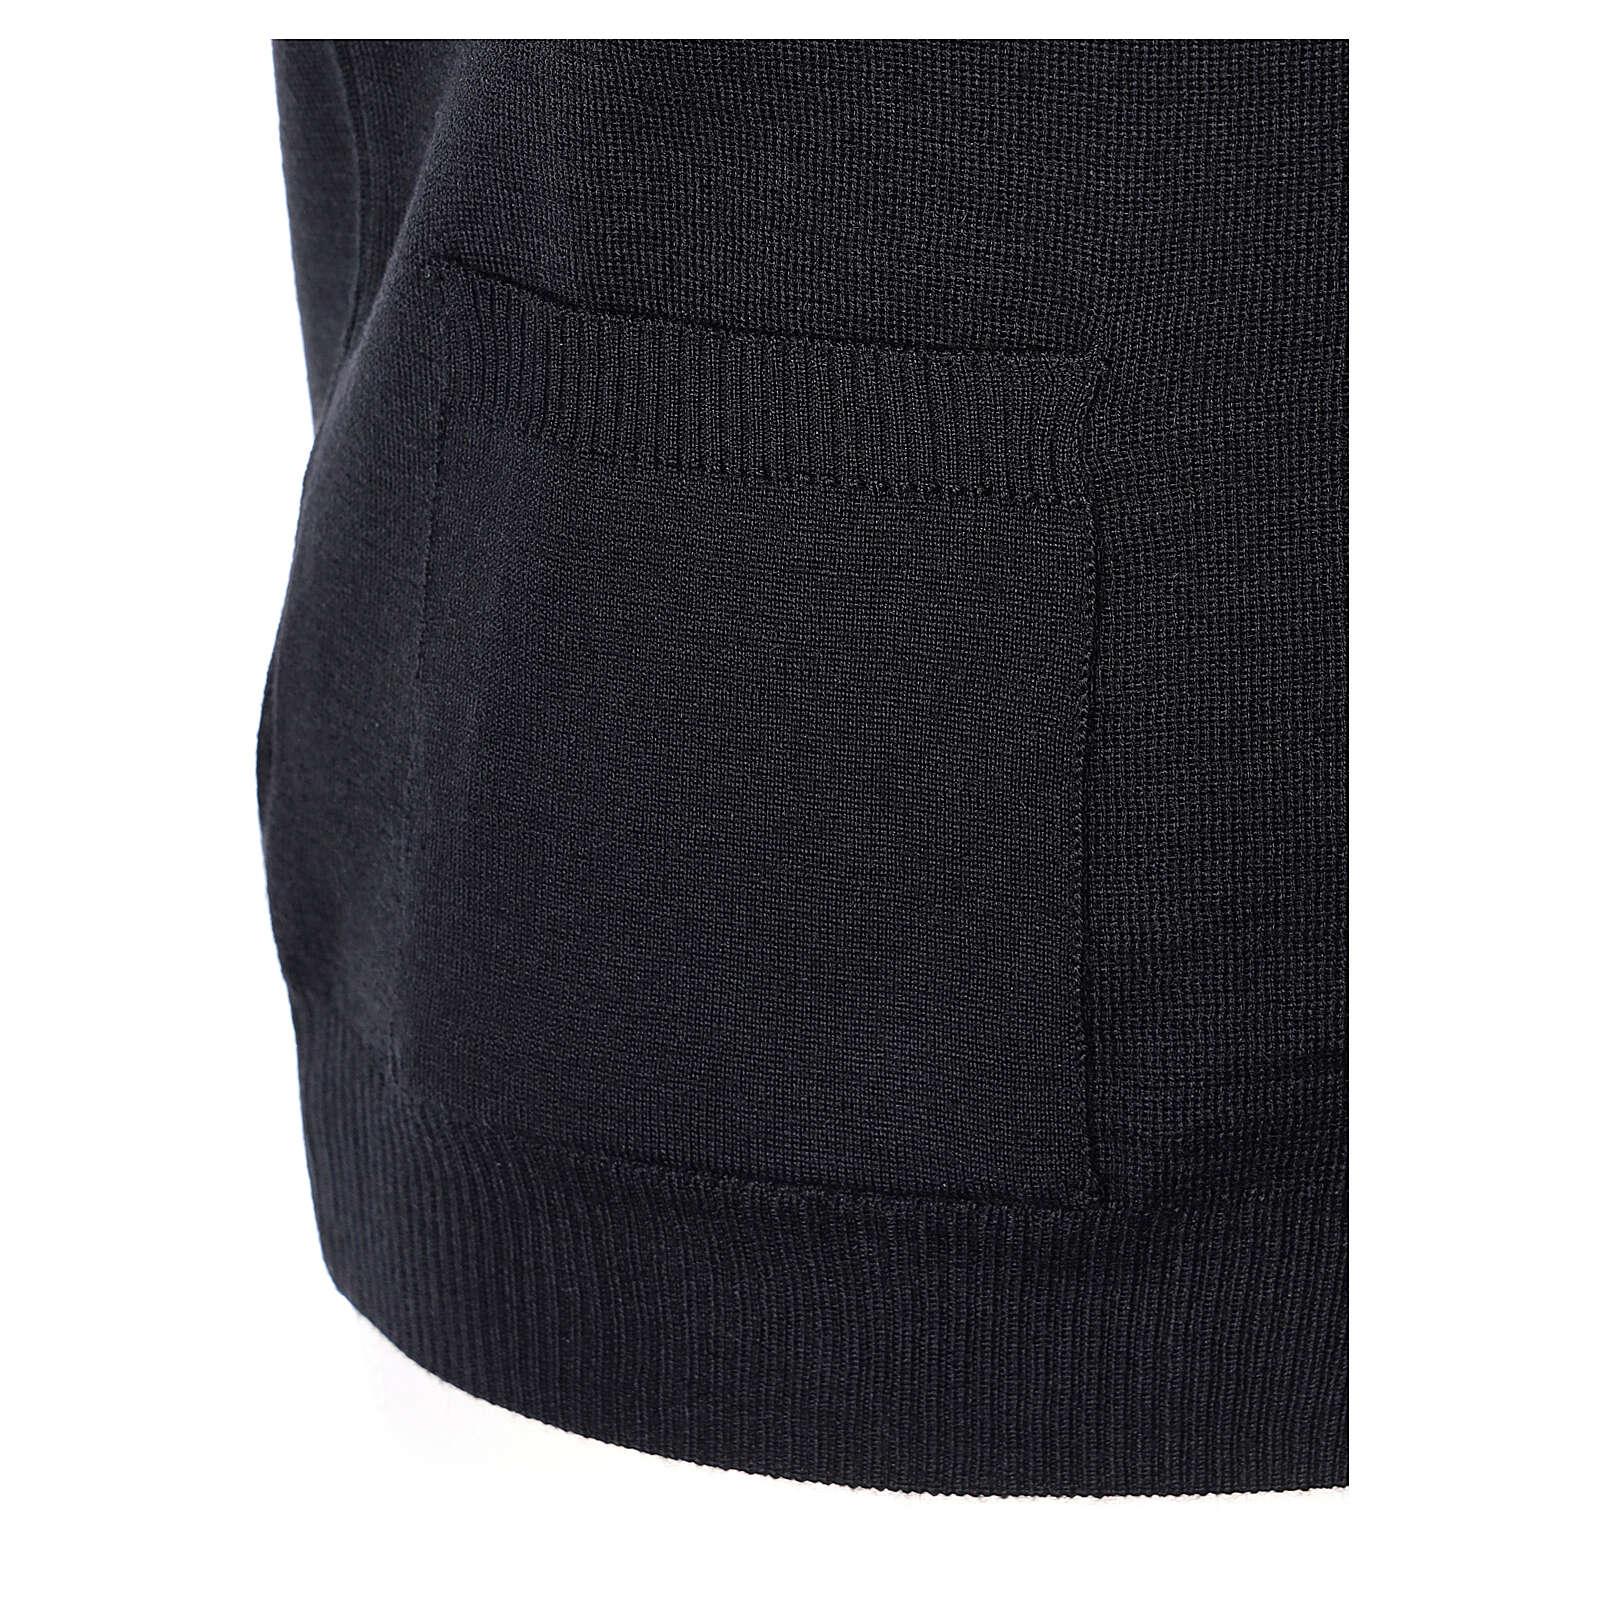 Colete sacerdote preto aberto com bolsos e botões In Primis 4